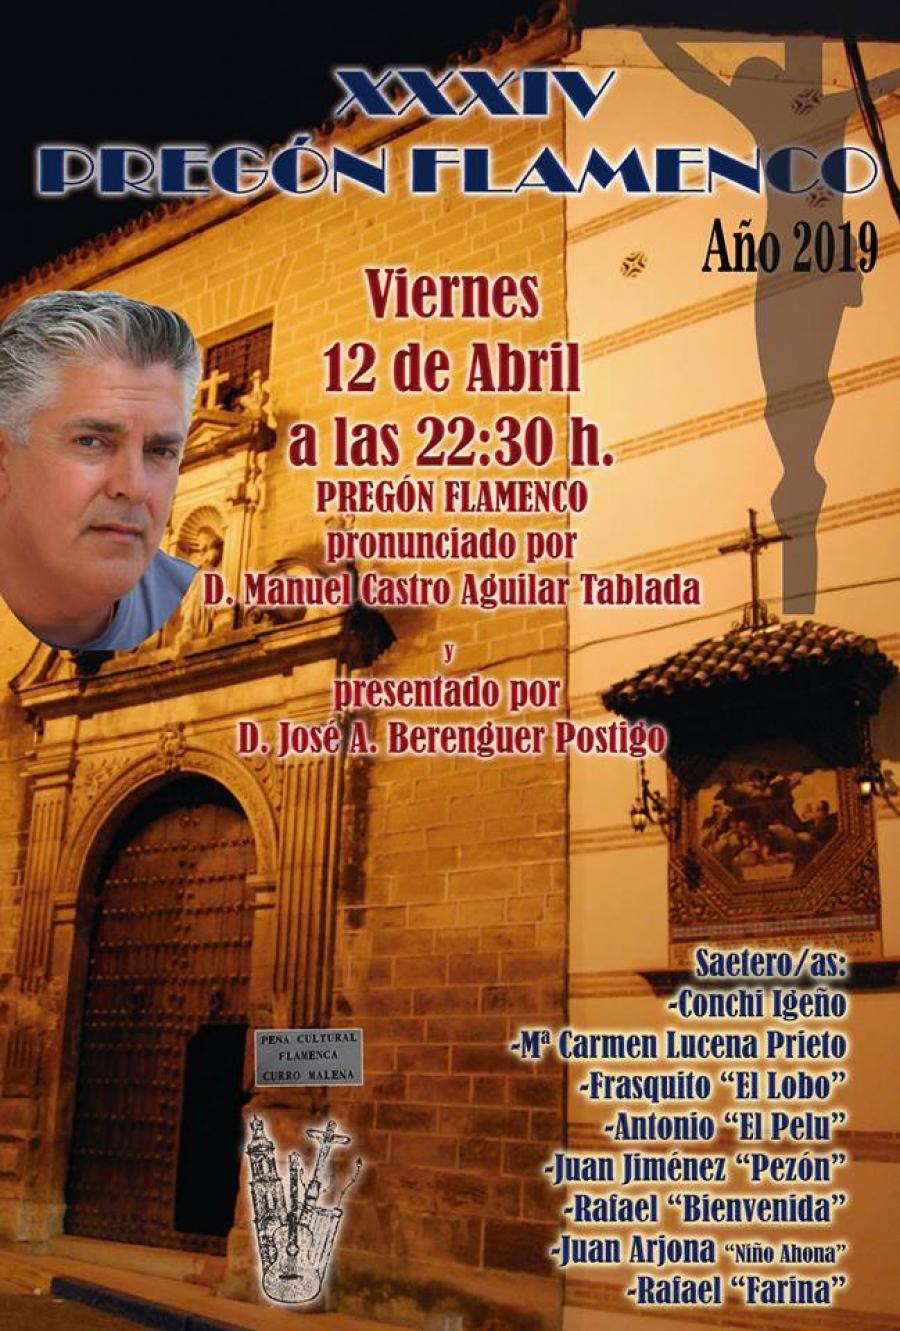 El Pregón Flamenco de Semana Santa estará a cargo de D. Manuel Castro